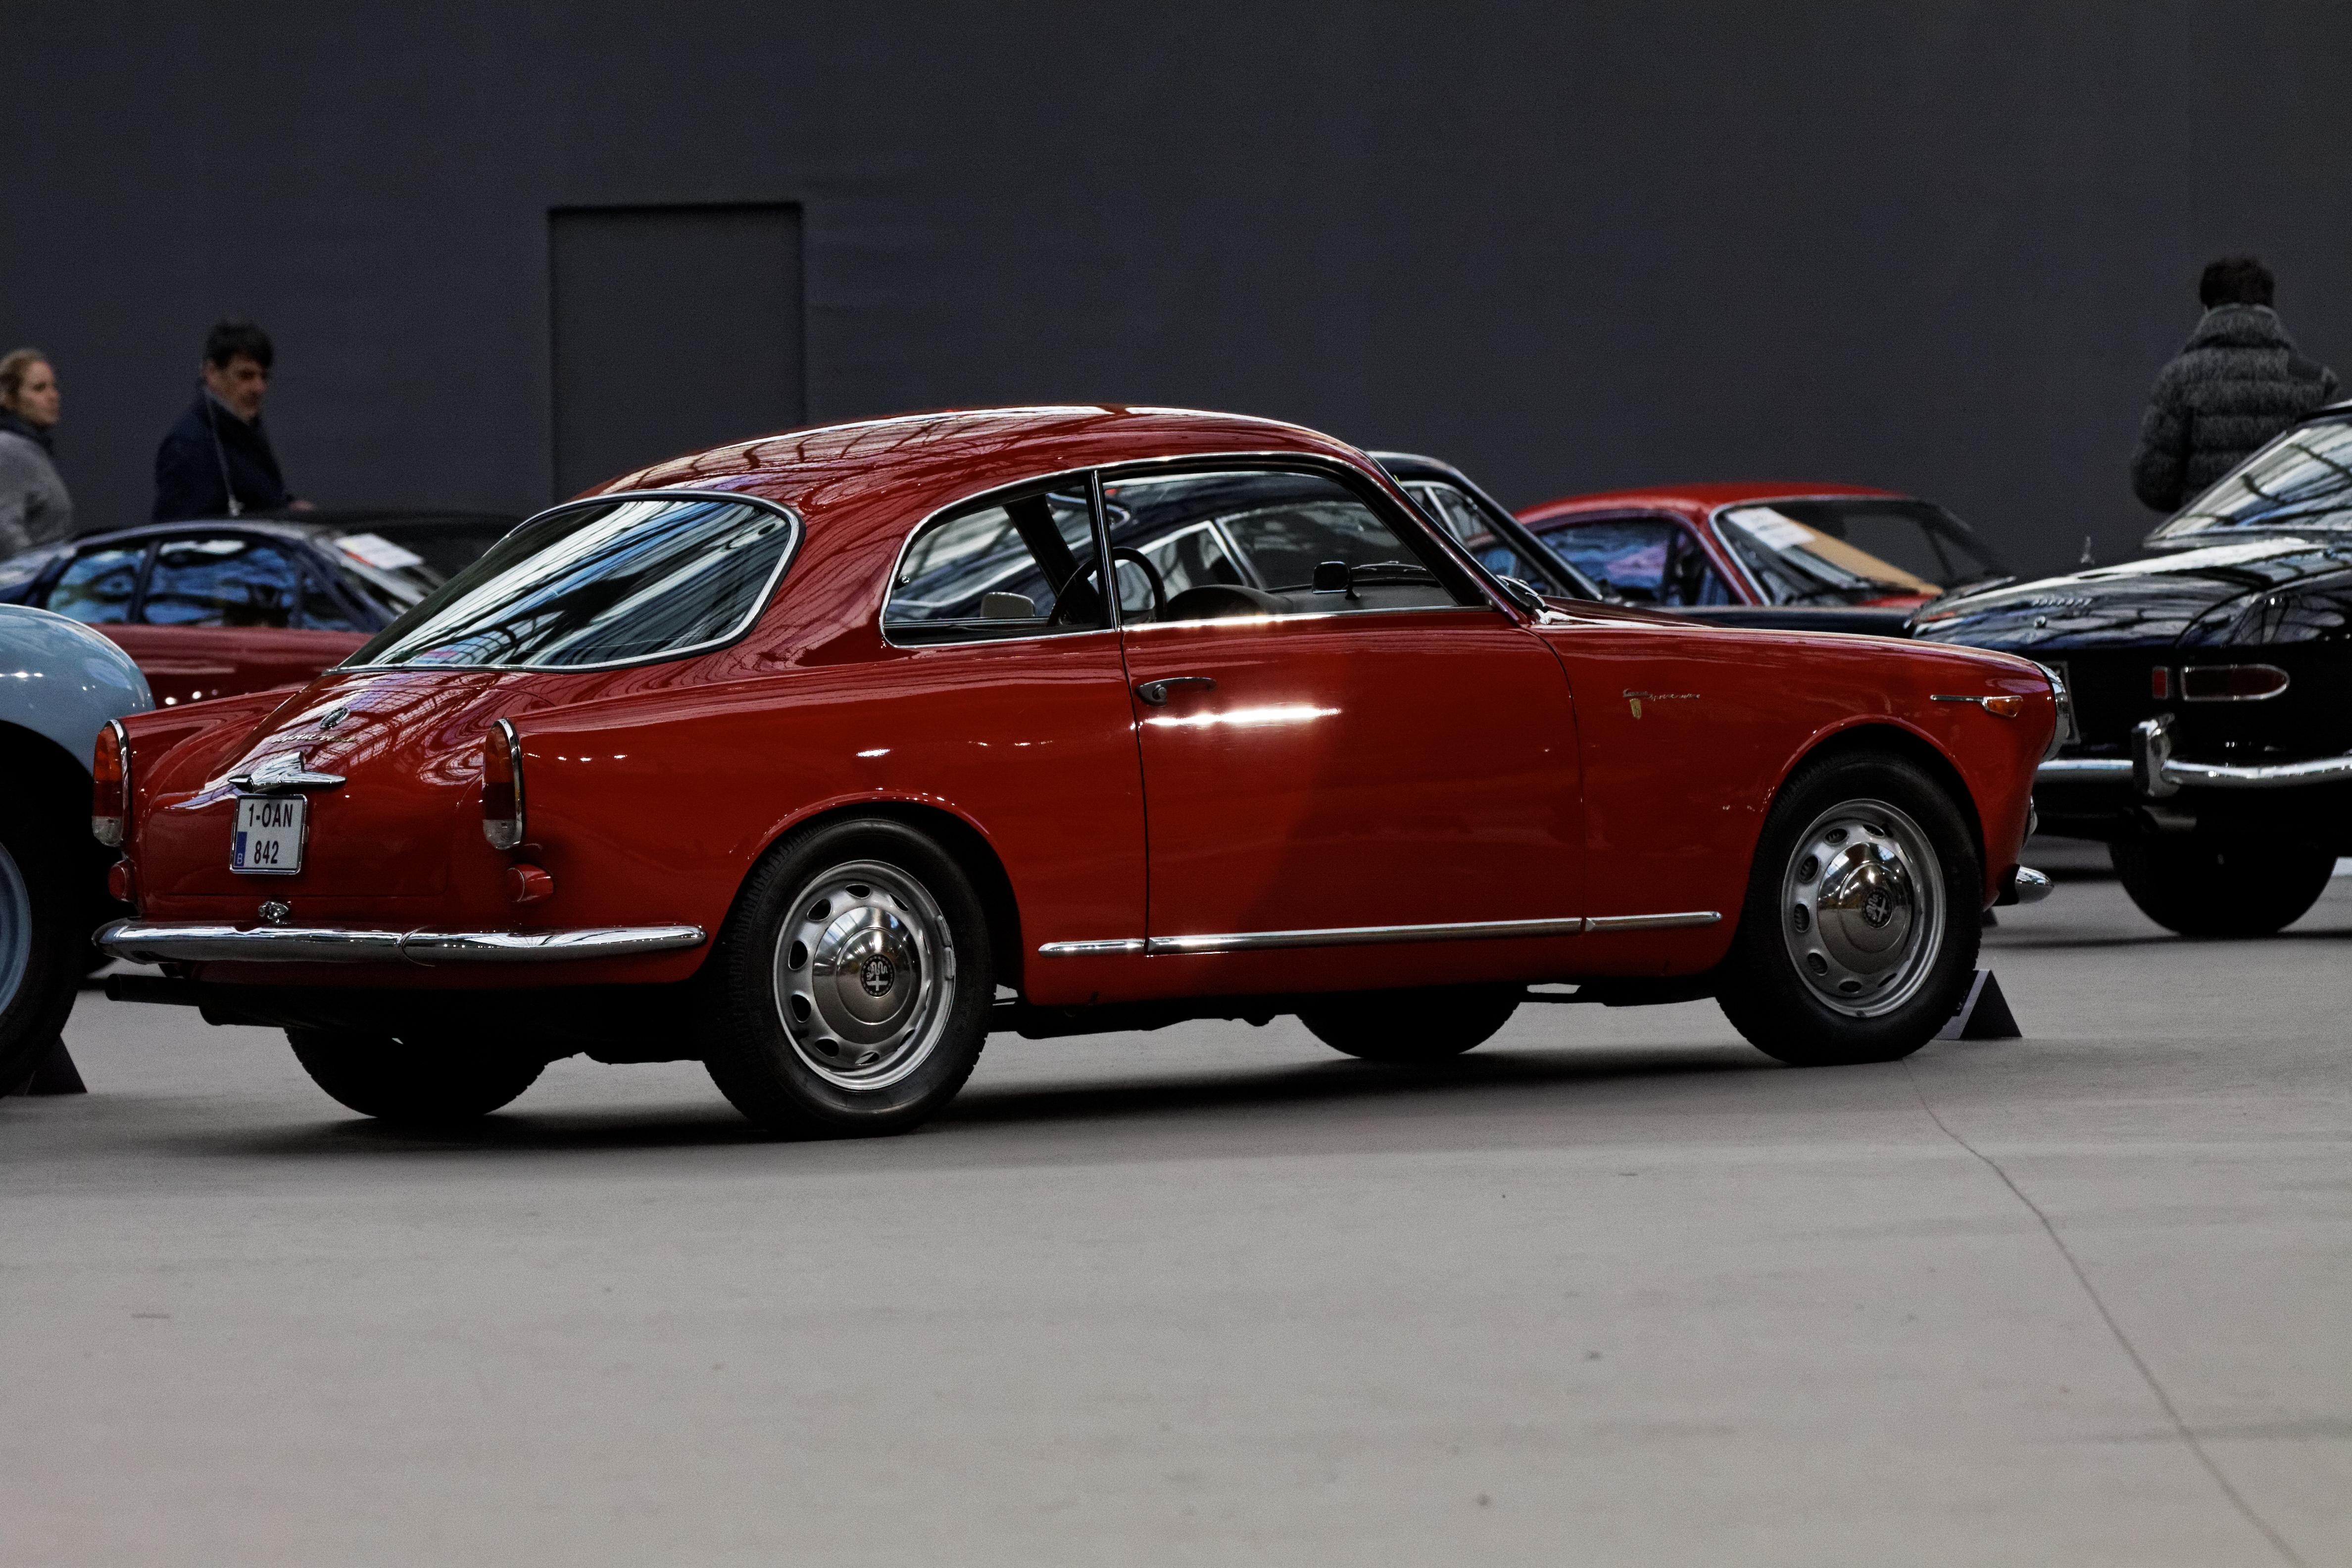 1956 Volkswagen Beetle photo also Alfa125 additionally 2002 2006 furthermore Pictures Alfa Romeo 2000 Berlina 102 1958 1962 63432 as well 1960 Fiat Abarth 1000 Bialbero 2. on 1958 alfa romeo